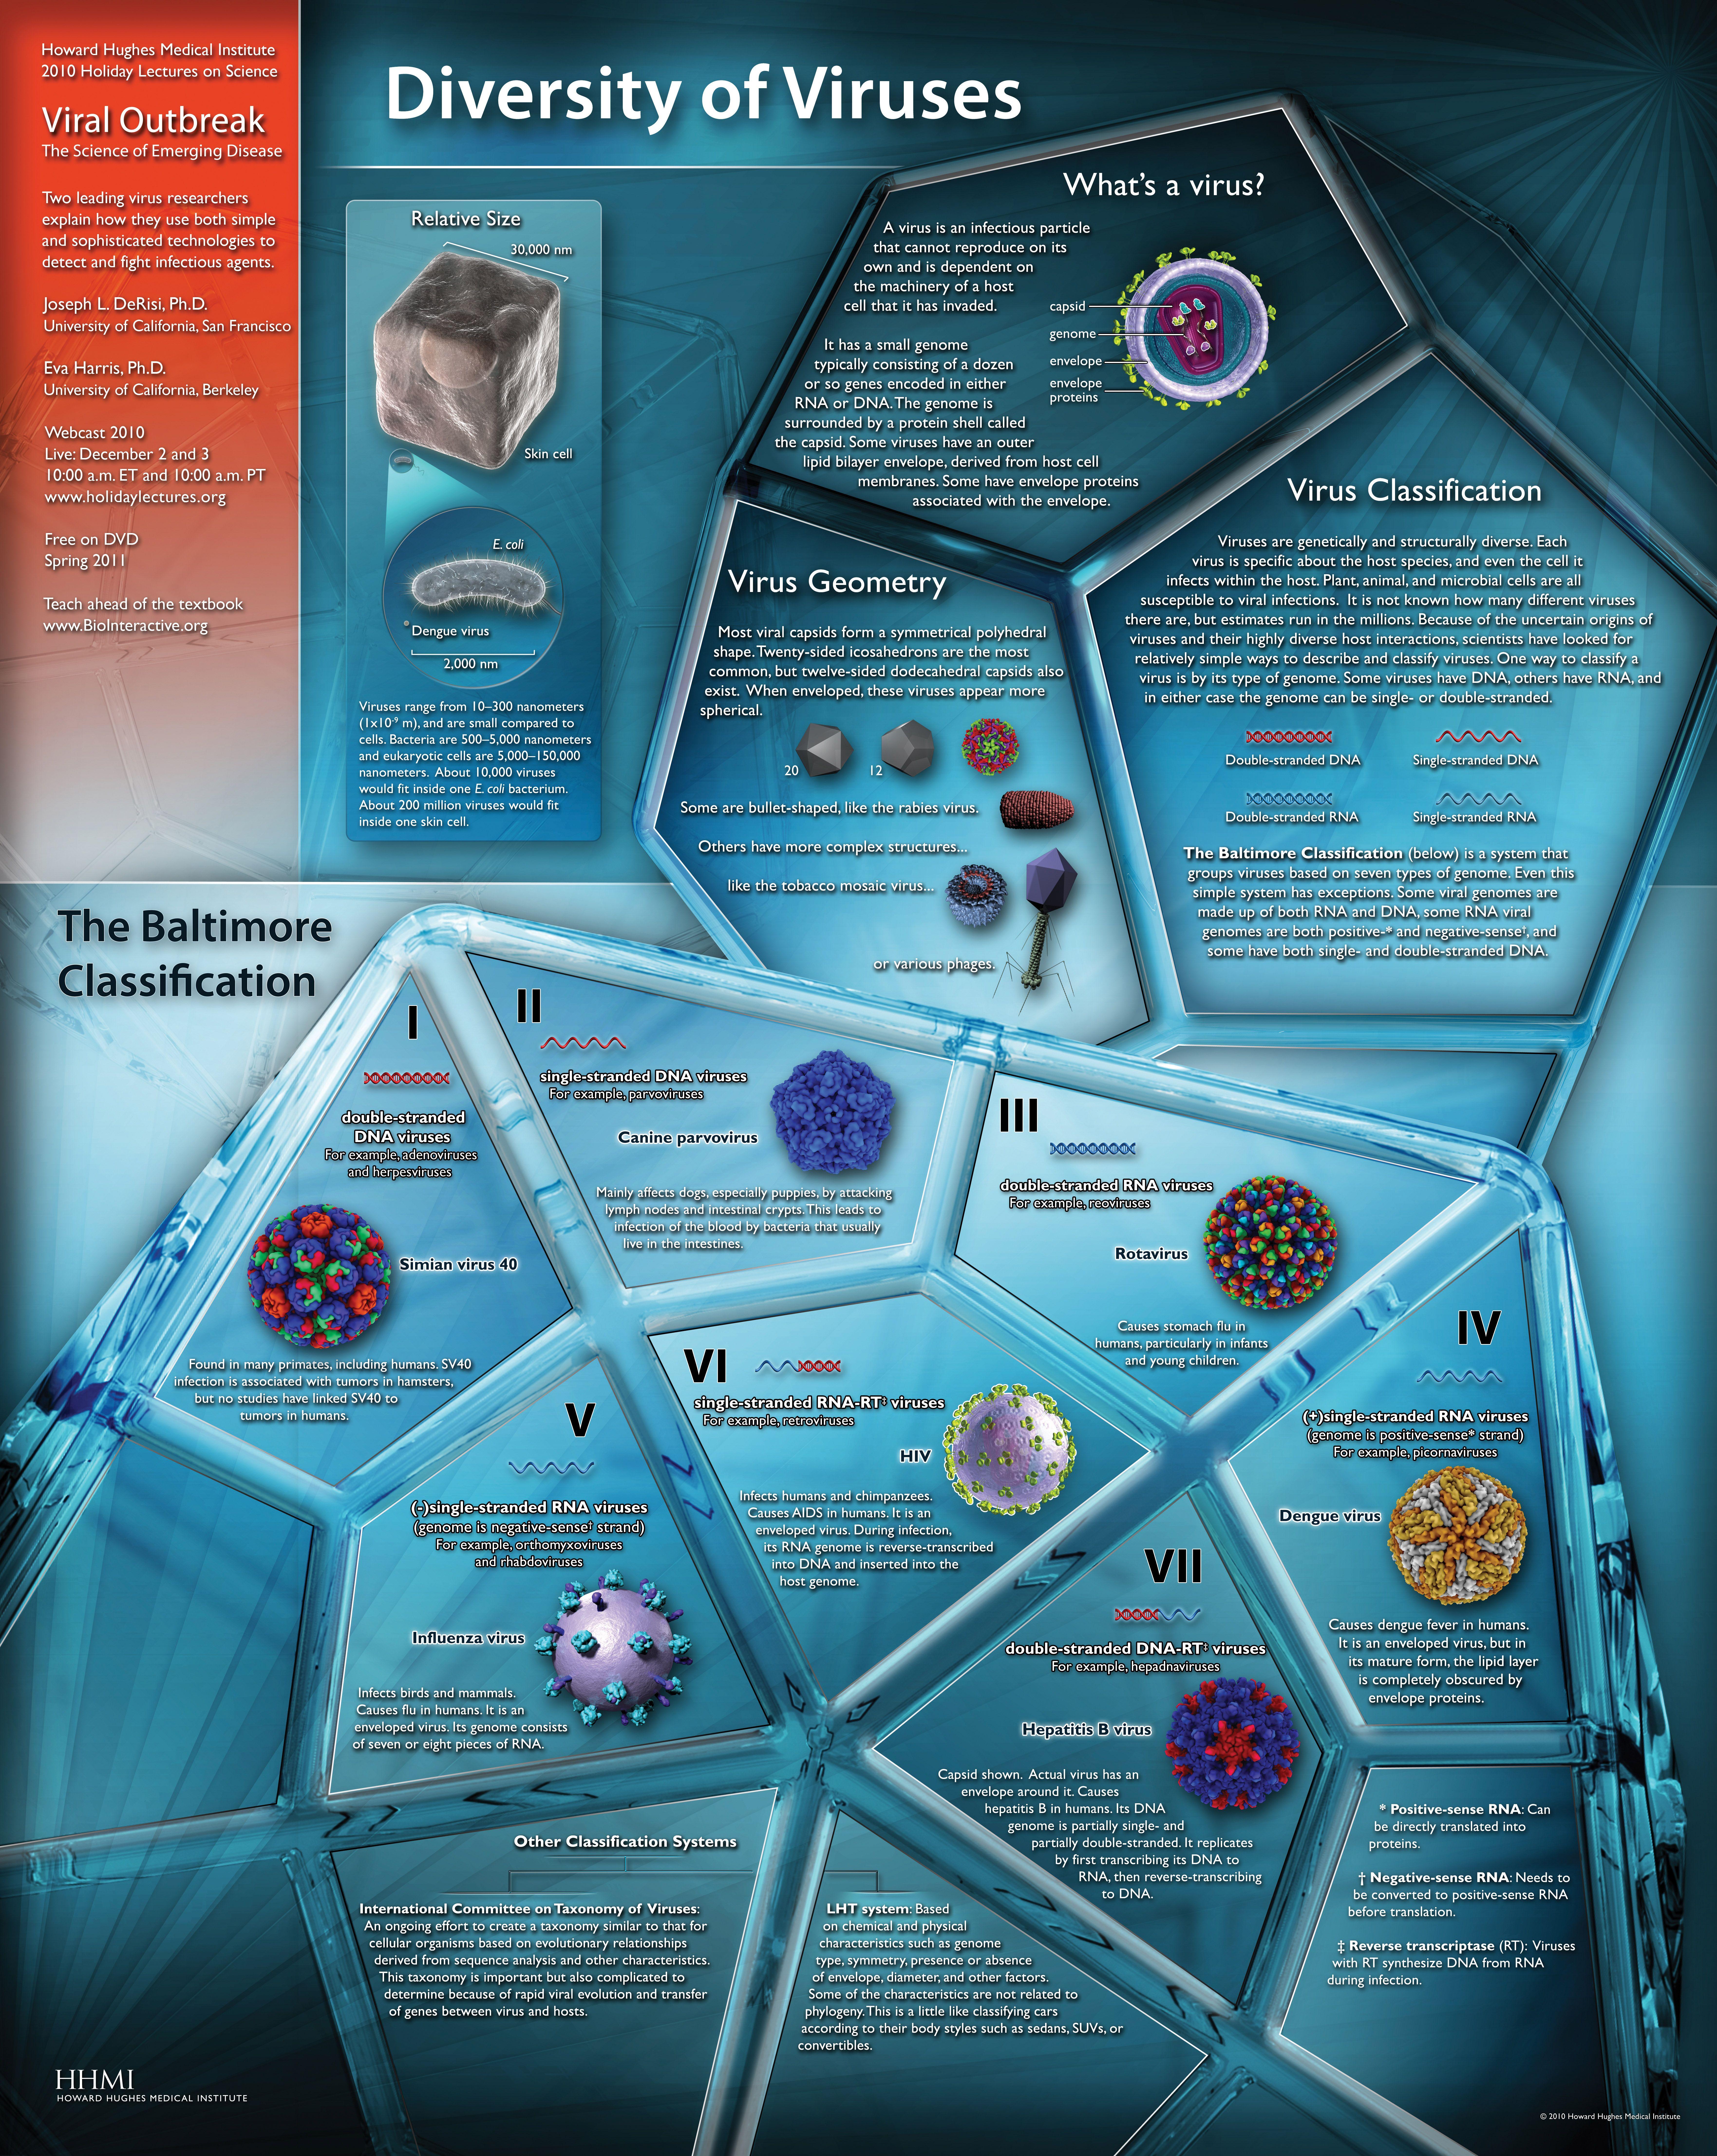 Diversity Of Viruses Poster Graphic - Illustrating